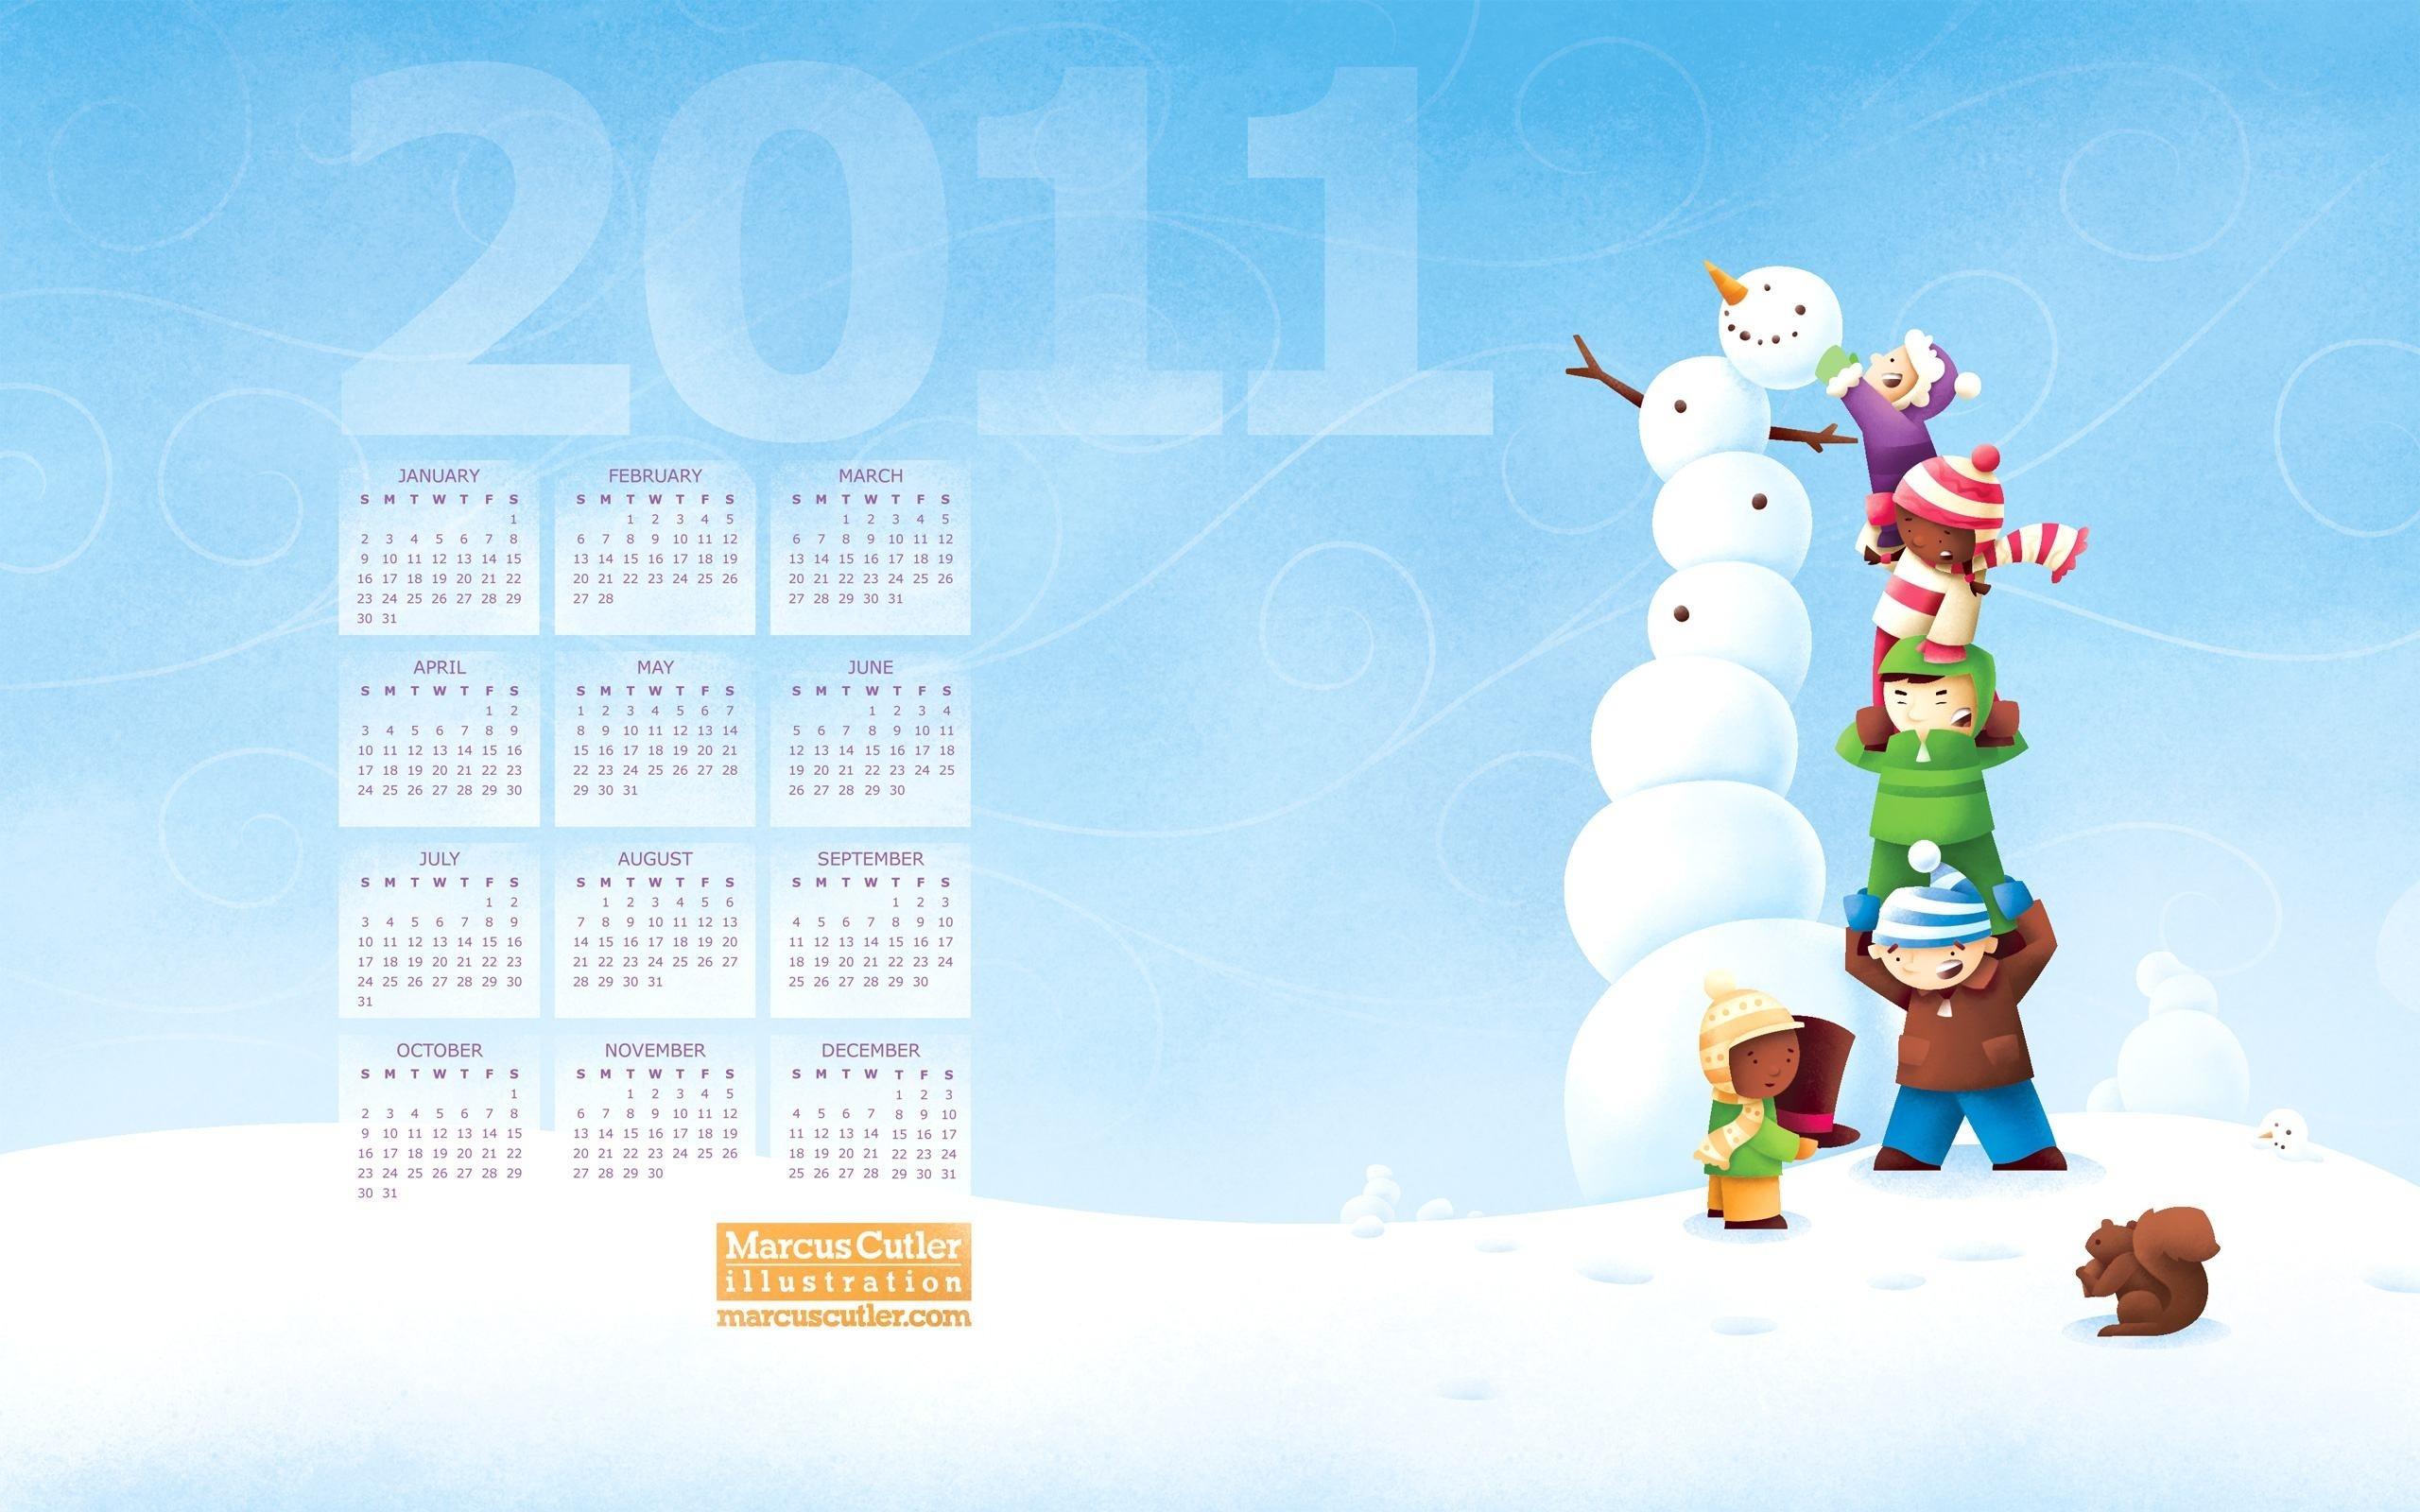 1920x1080 Cute Snowman Wallpapers